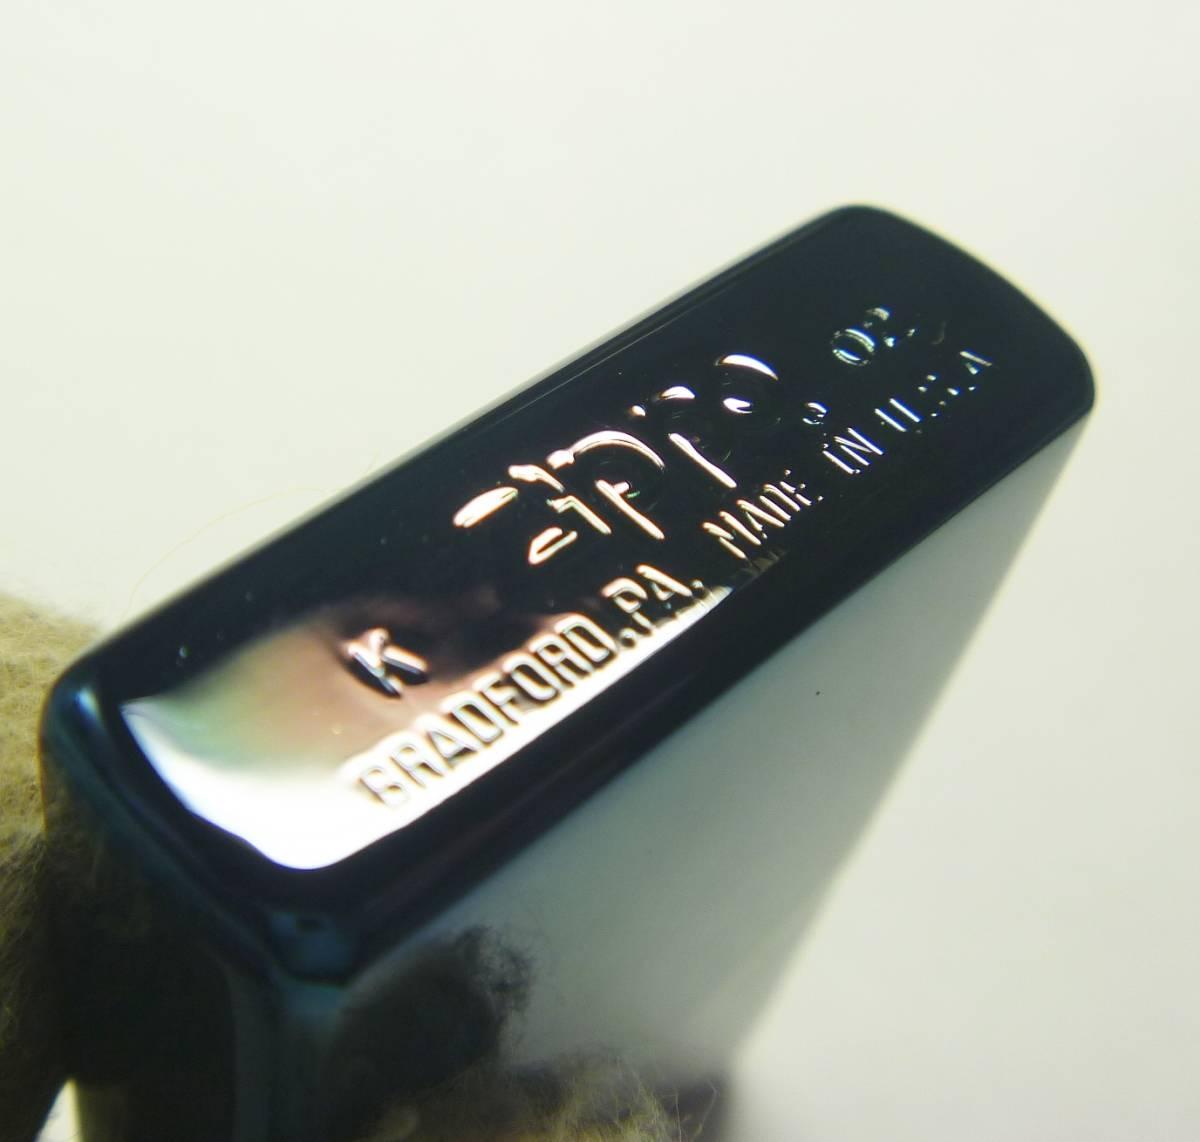 K6087tc 未使用 Zippo ジッポー PVDブルーチタン 富士山A ライター 喫煙 タバコ_画像3